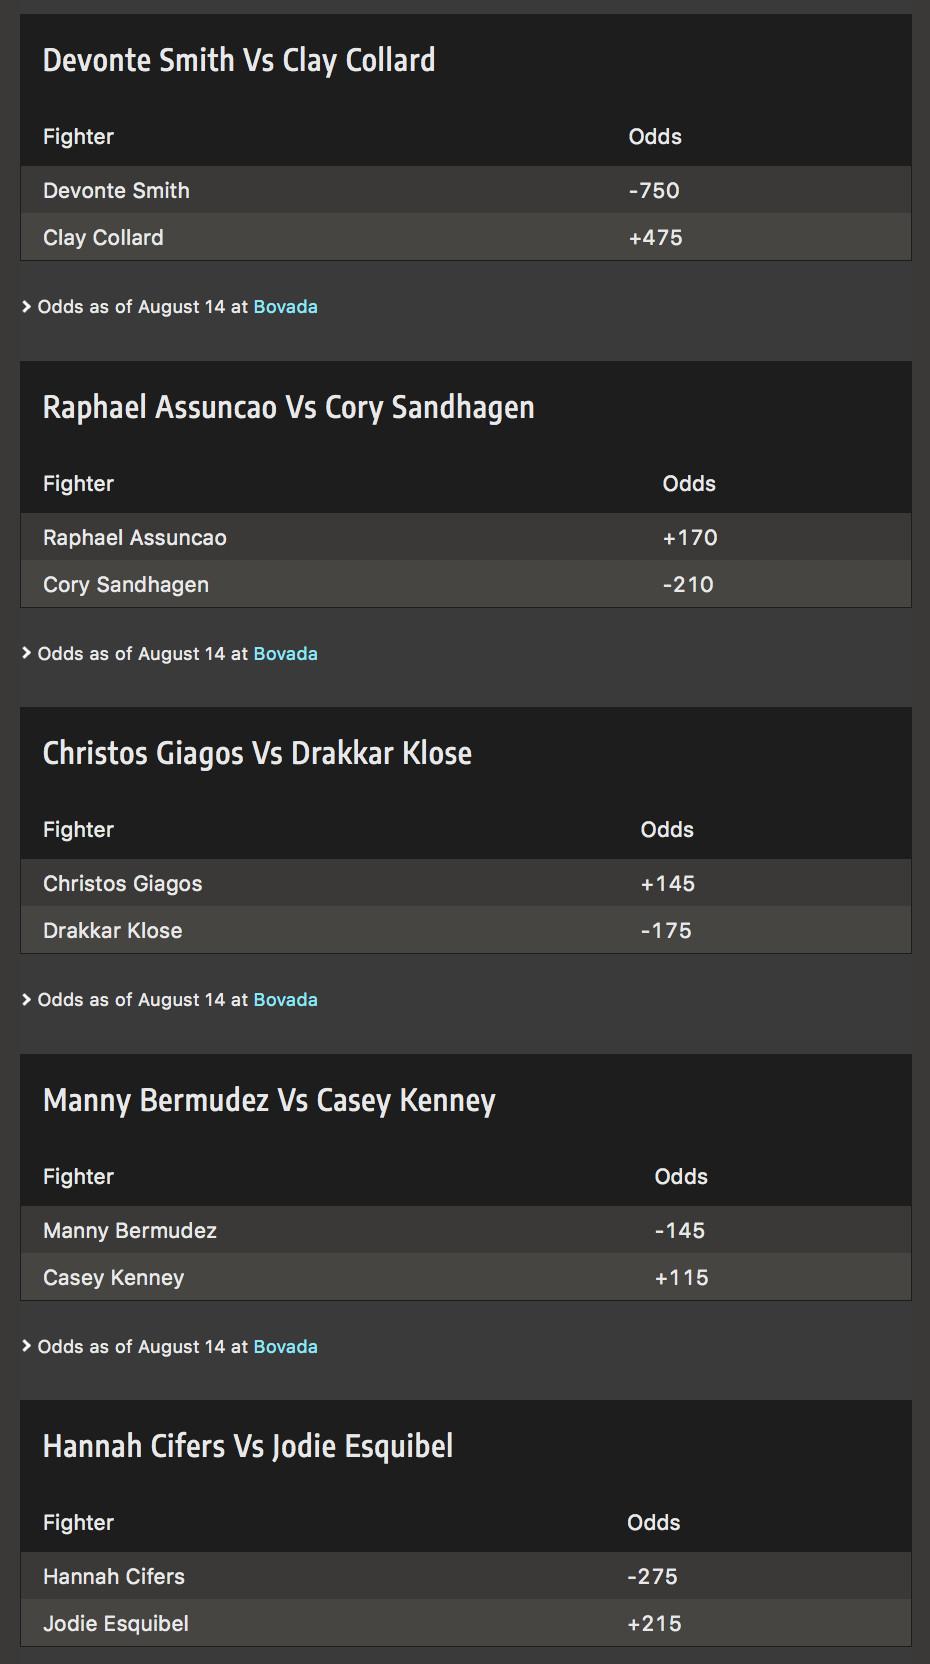 UFC 241 final betting odds: Cormier & Pettis favored, Miocic